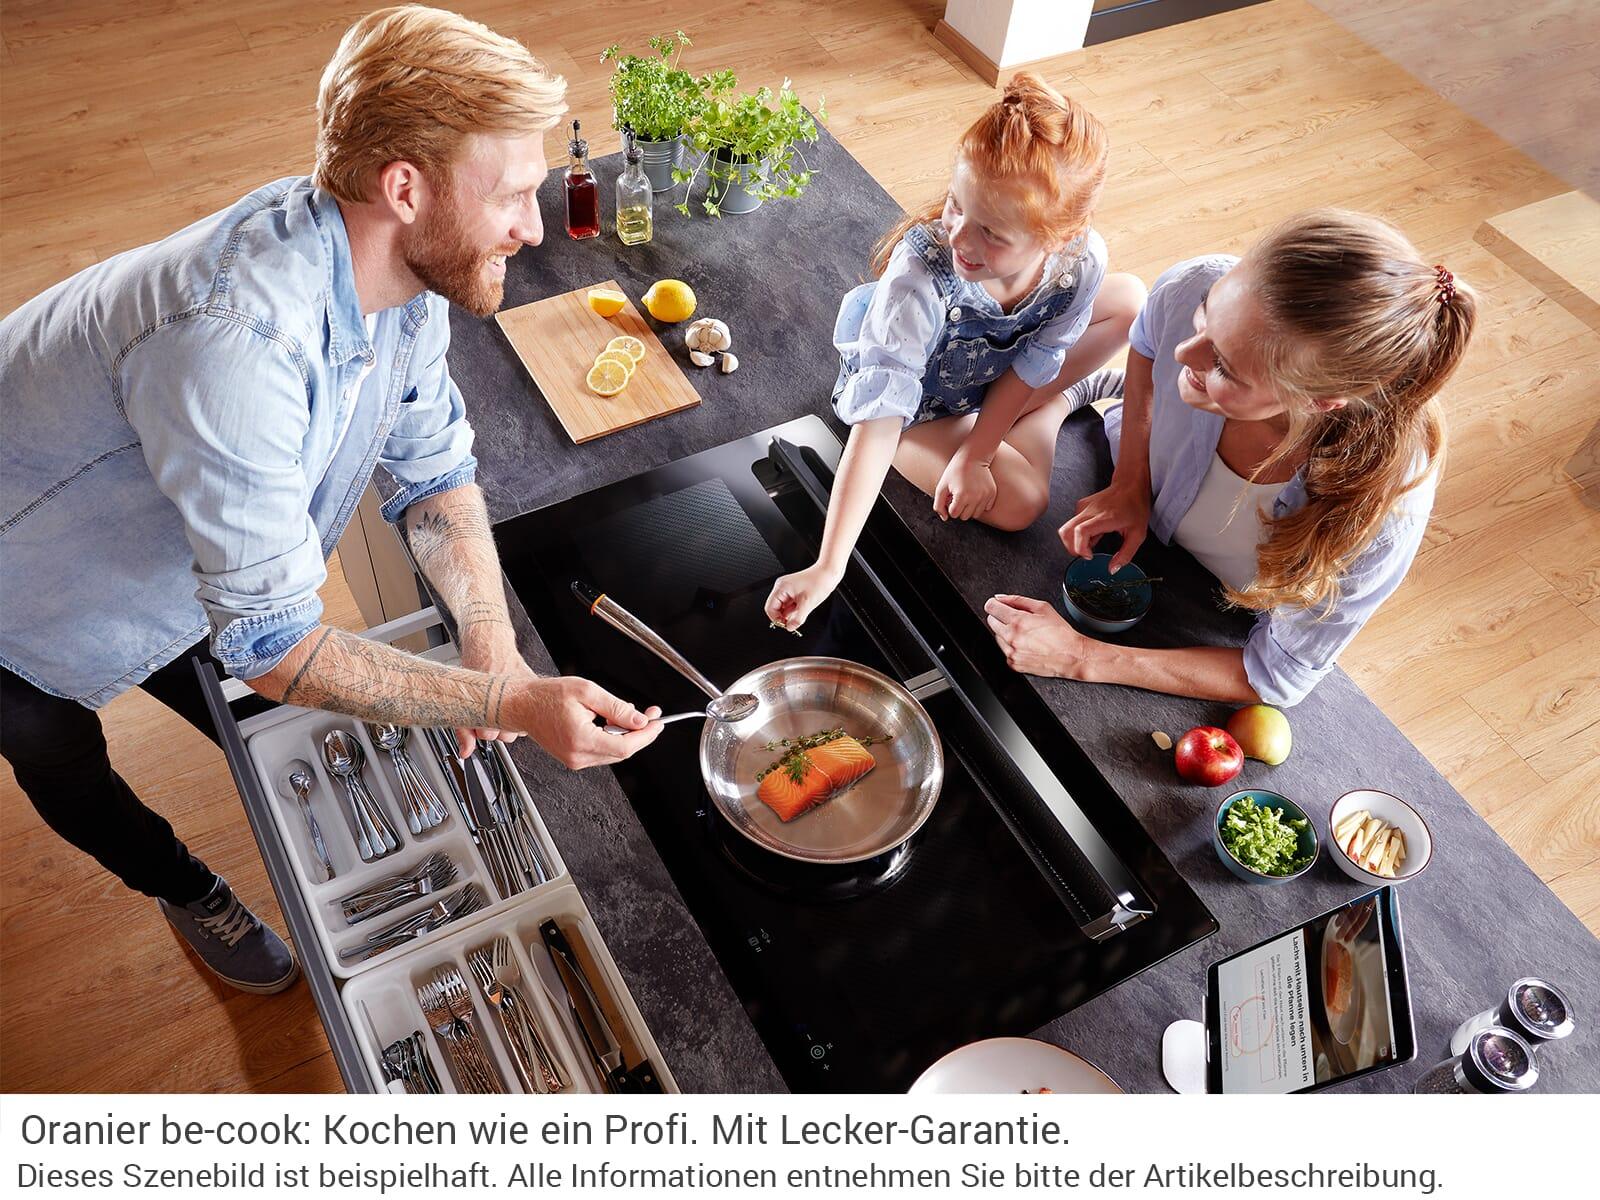 Oranier KFL 2094 be-cook - 2094 76 Induktionskochfeld-Dunstabzug-Kombination Umluft